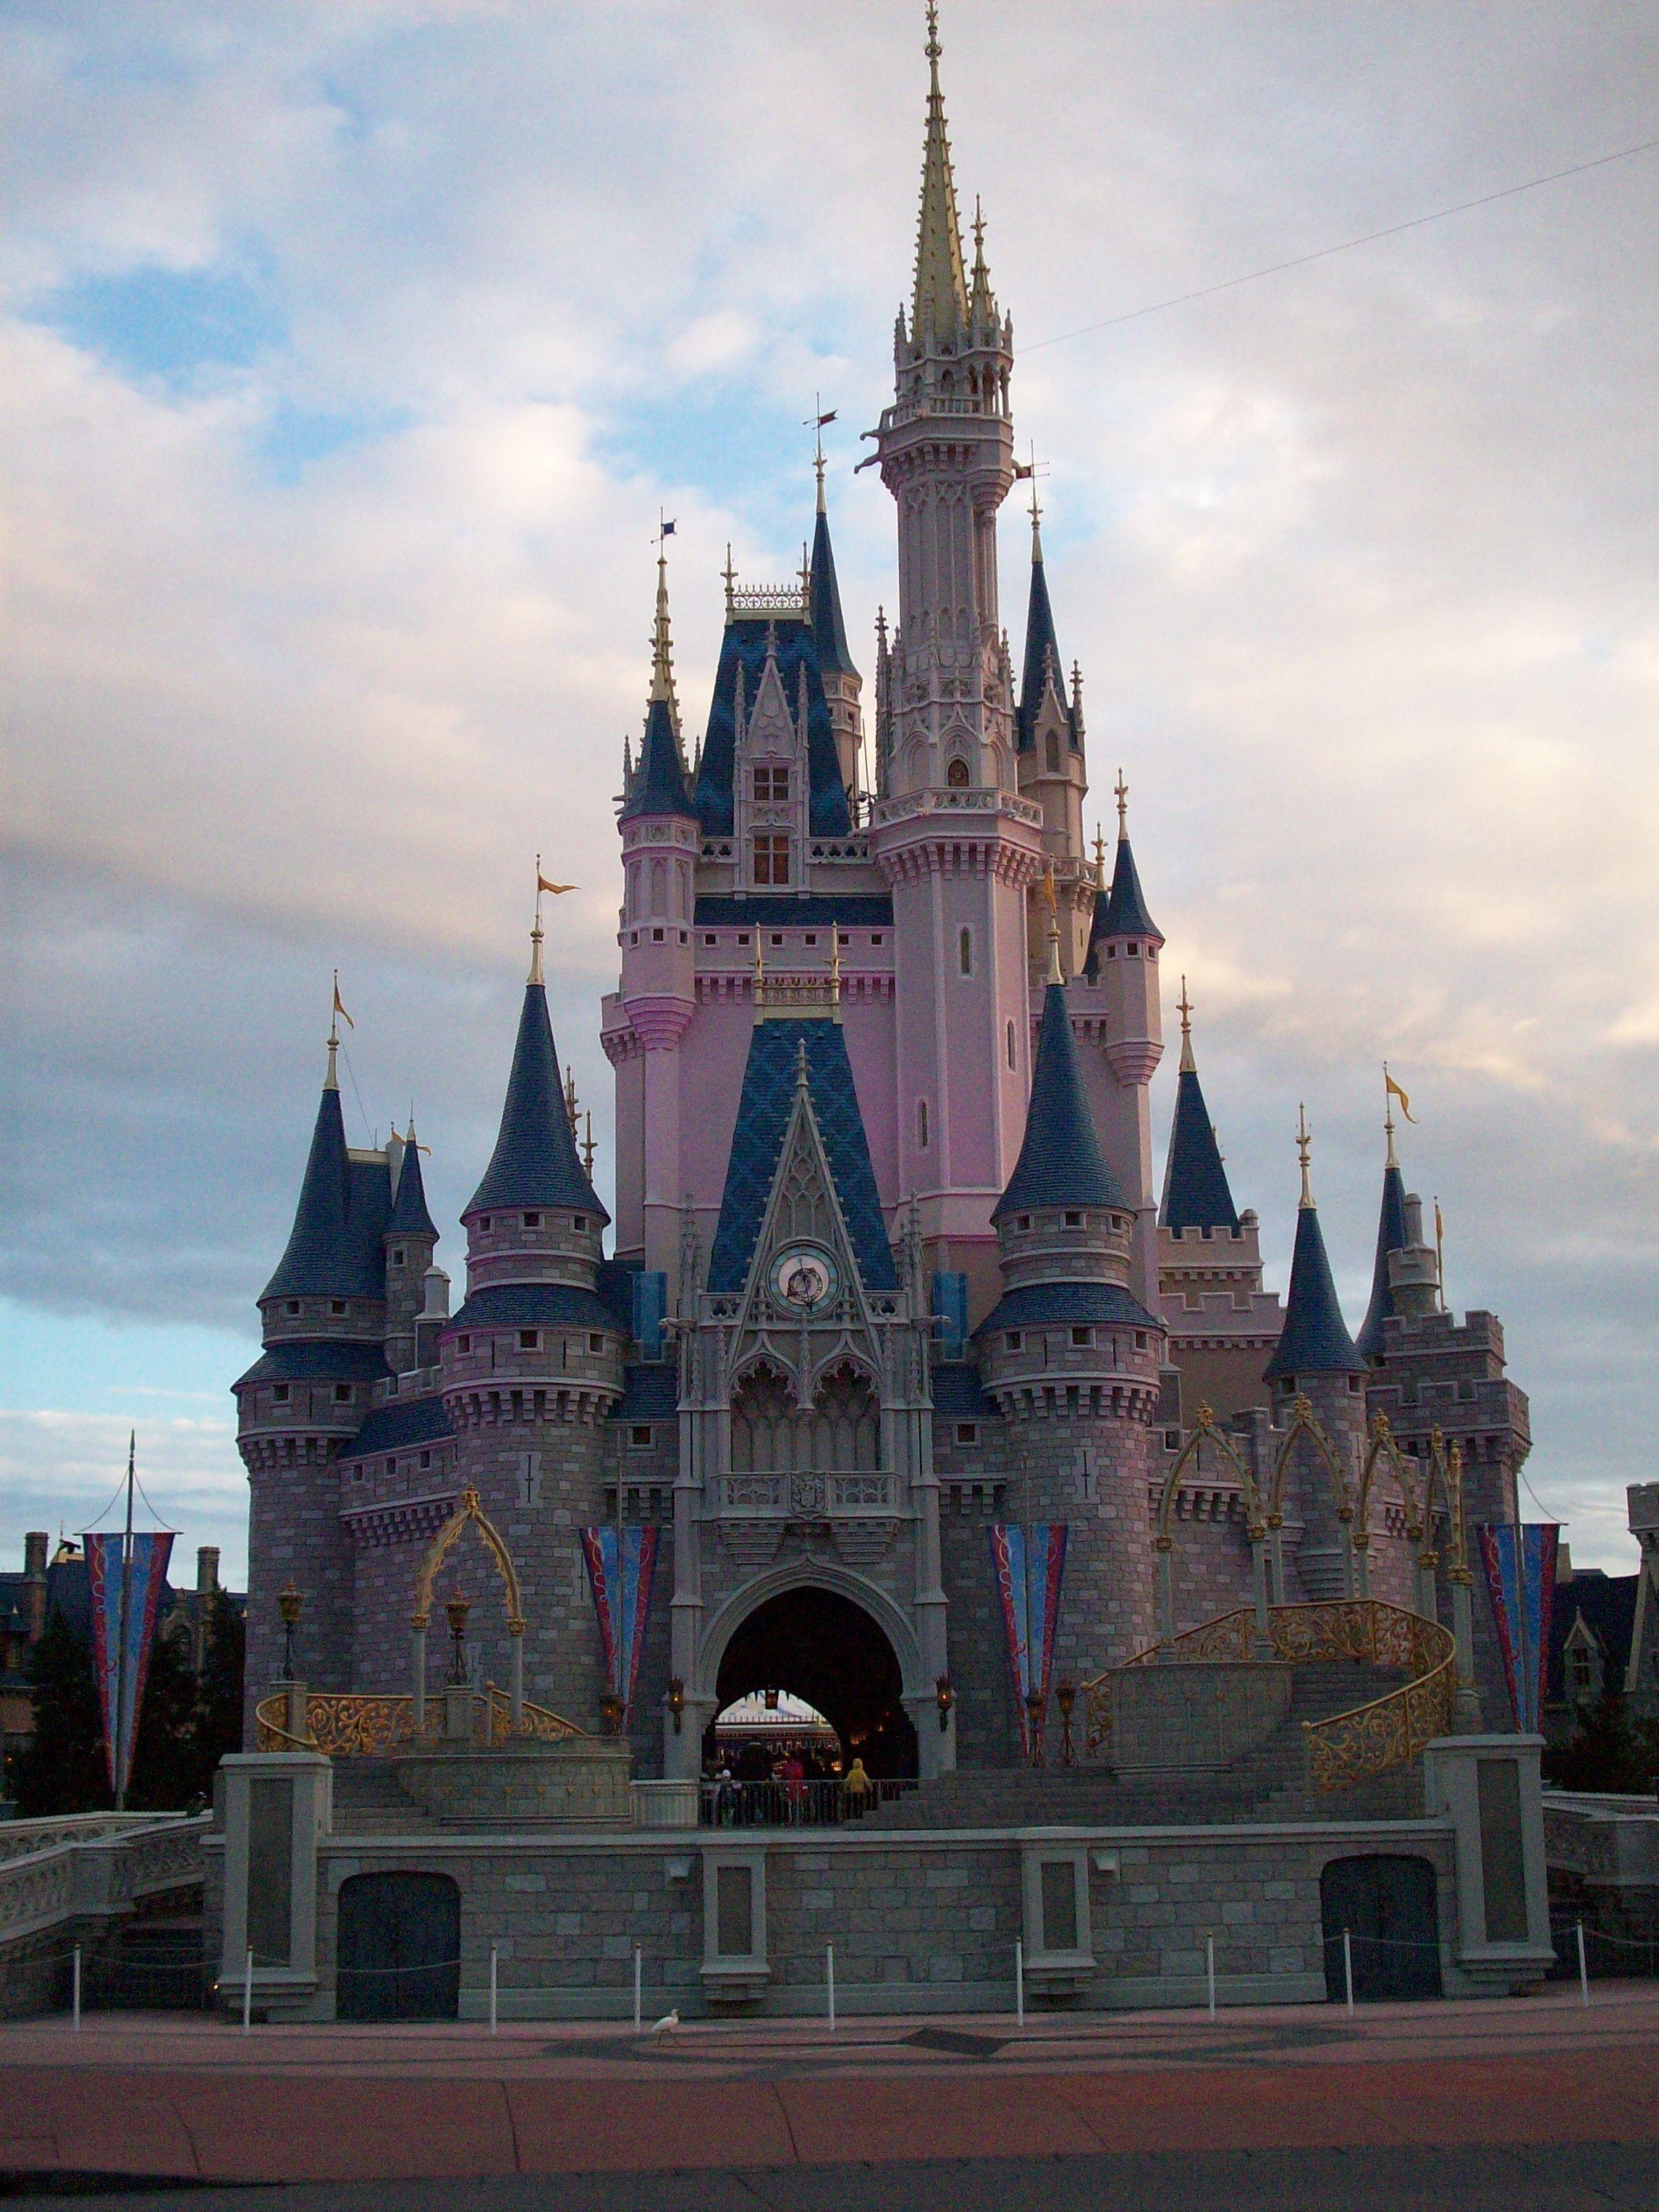 Cinderella's Castle looking very pink.